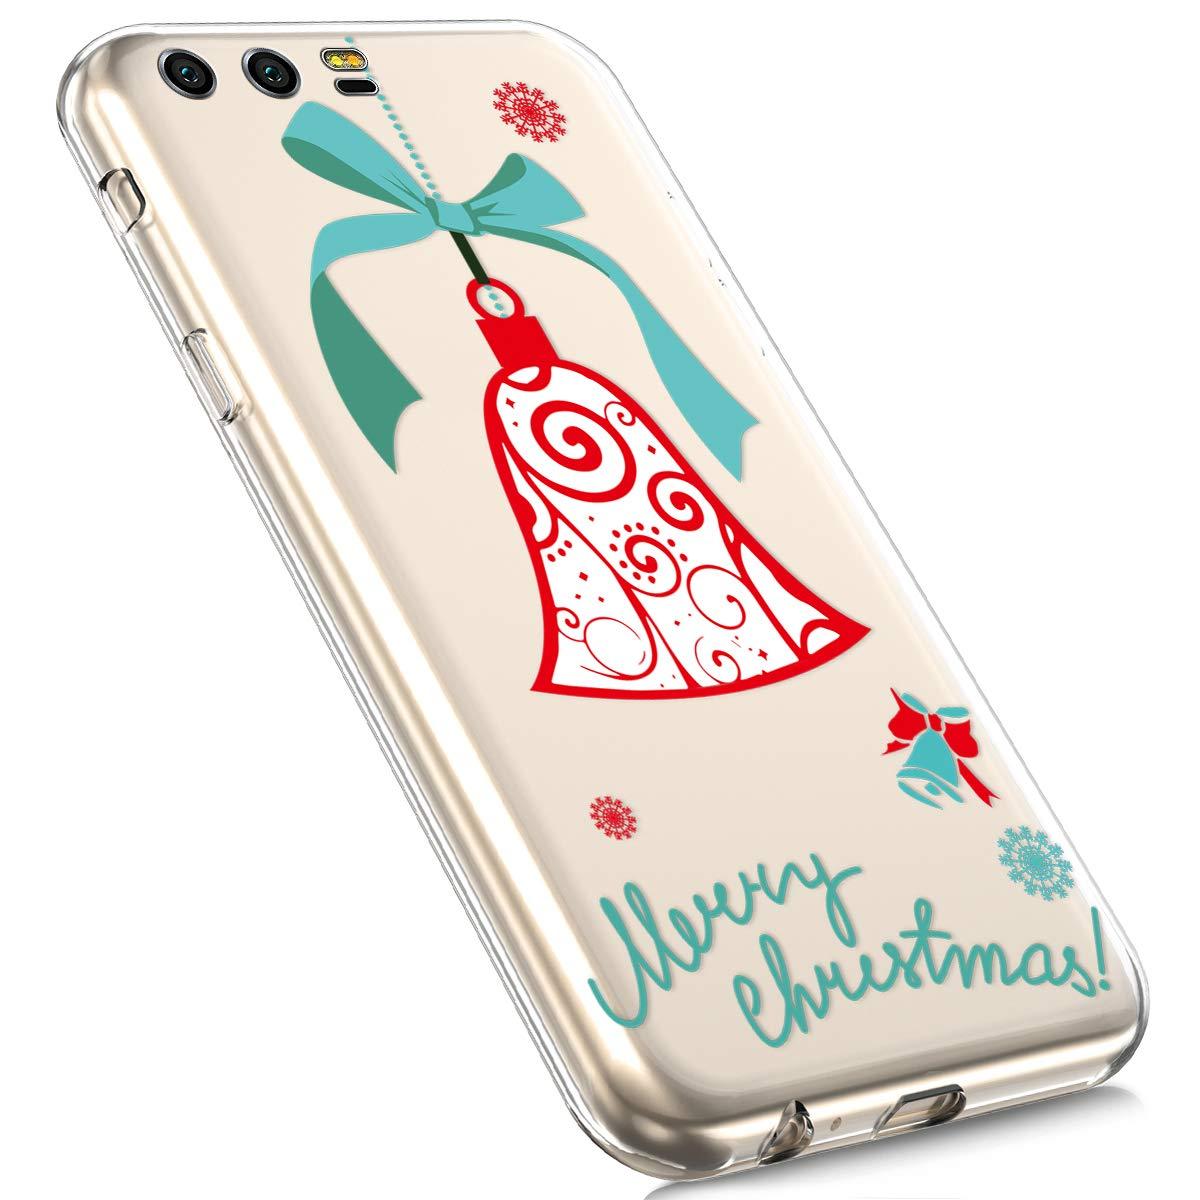 MoreChioce Coque Huawei Honor 10,Coque Huawei Honor 10 Transparente, Transaprent Silicone Cerf Noël Neige Christmas Souple Anti-rayures Flexible Bumper pour Huawei Honor 10 Ampoule Noël